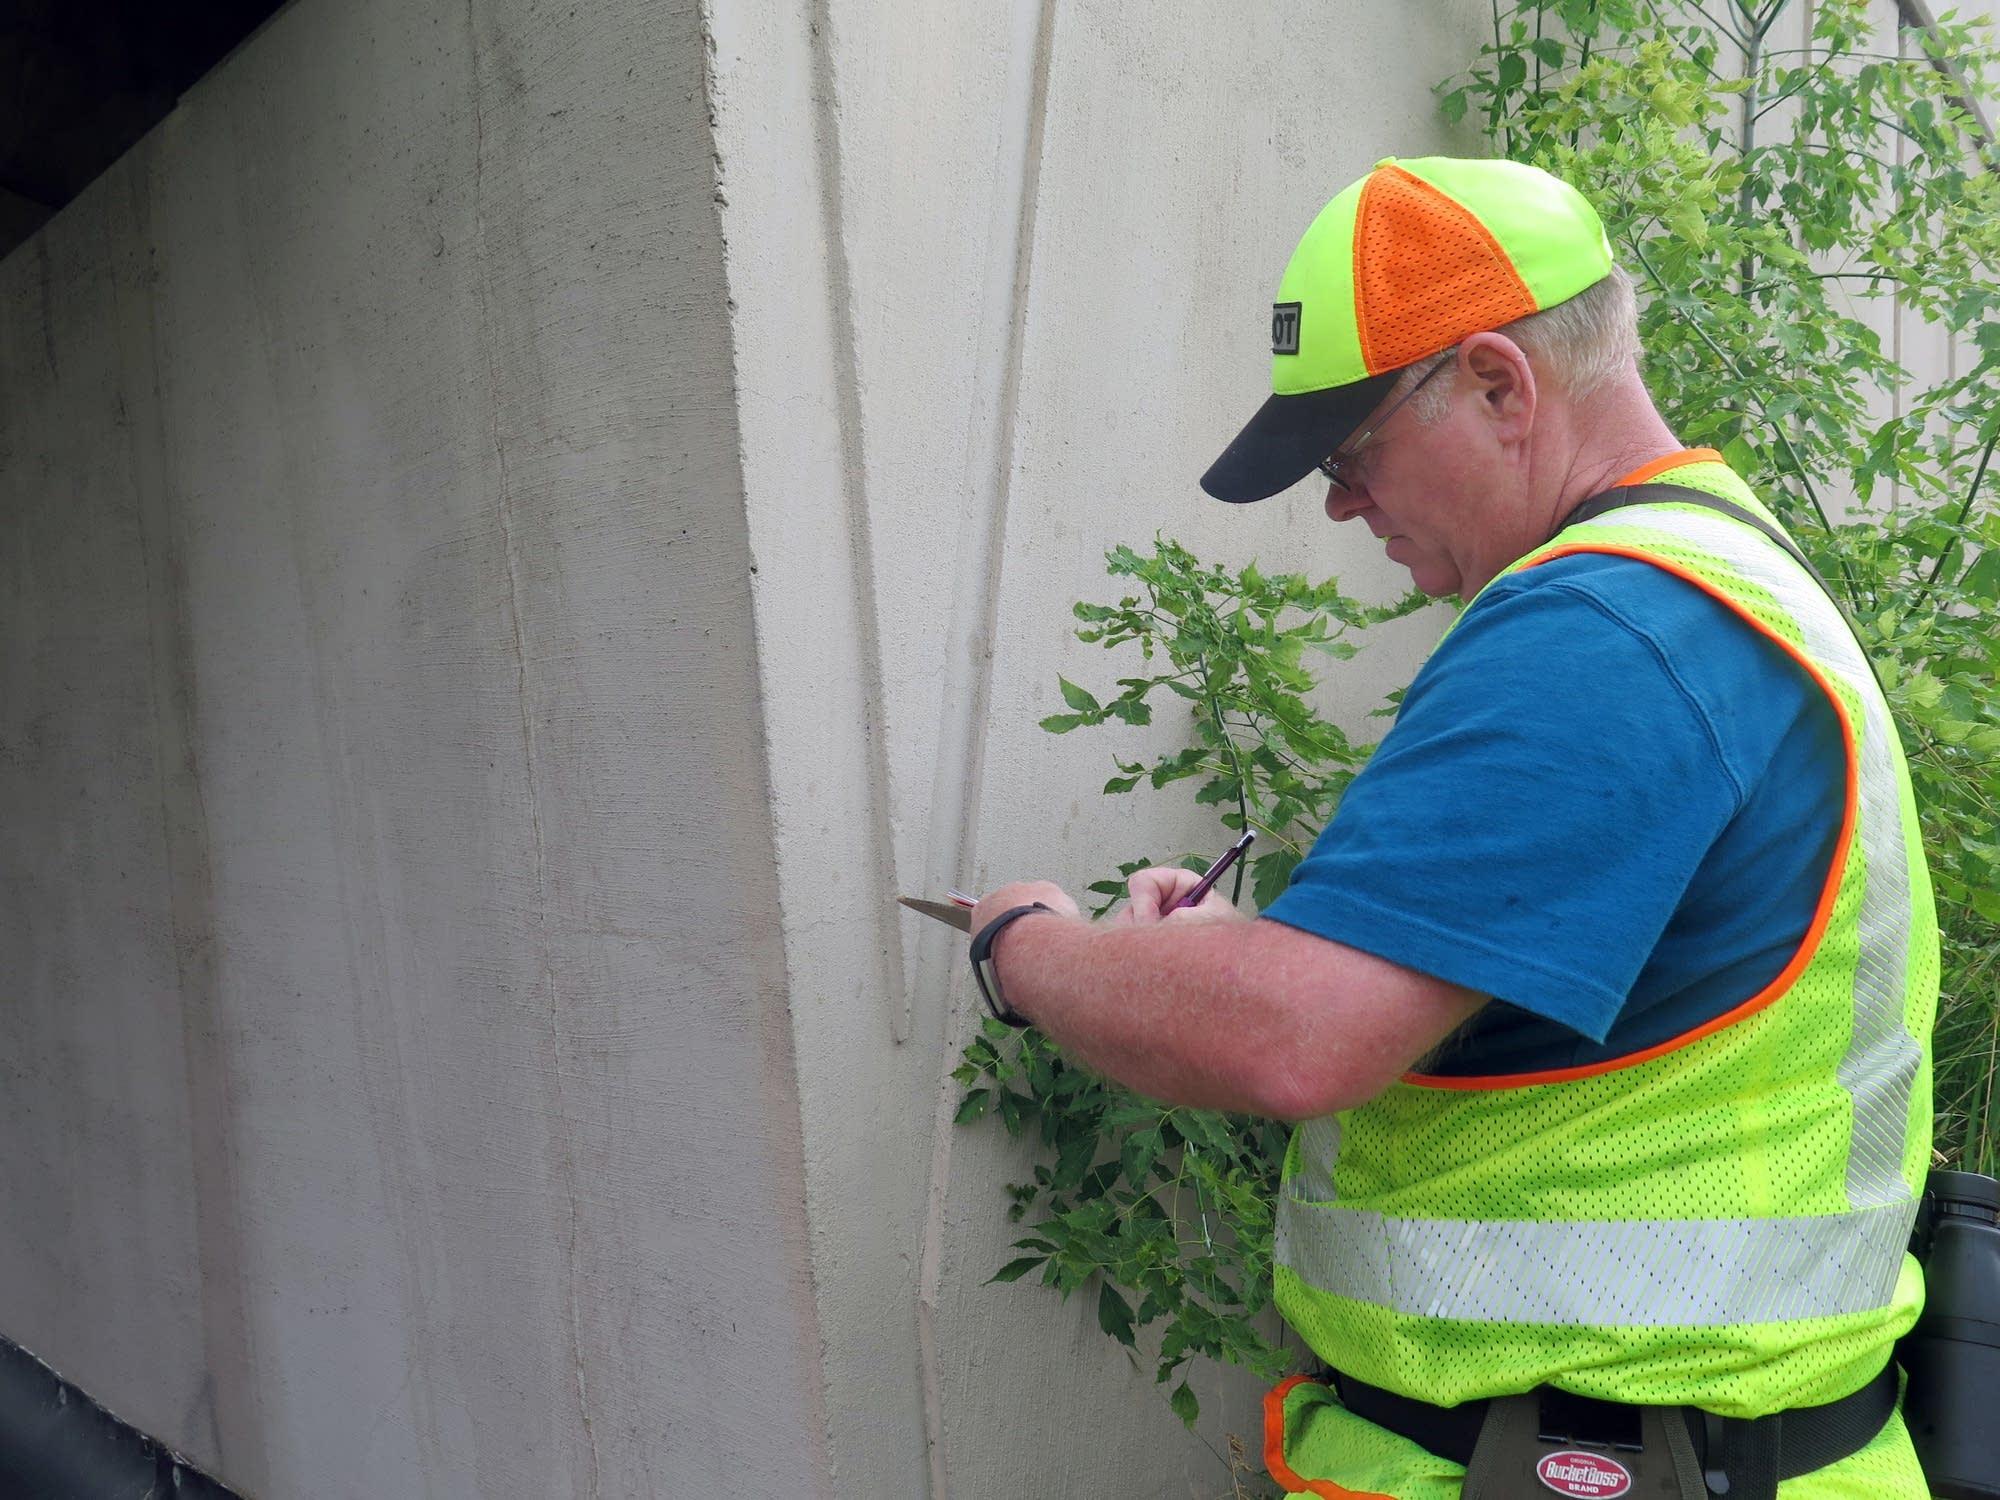 Brad Dumbeck, a MnDOT bridge inspector